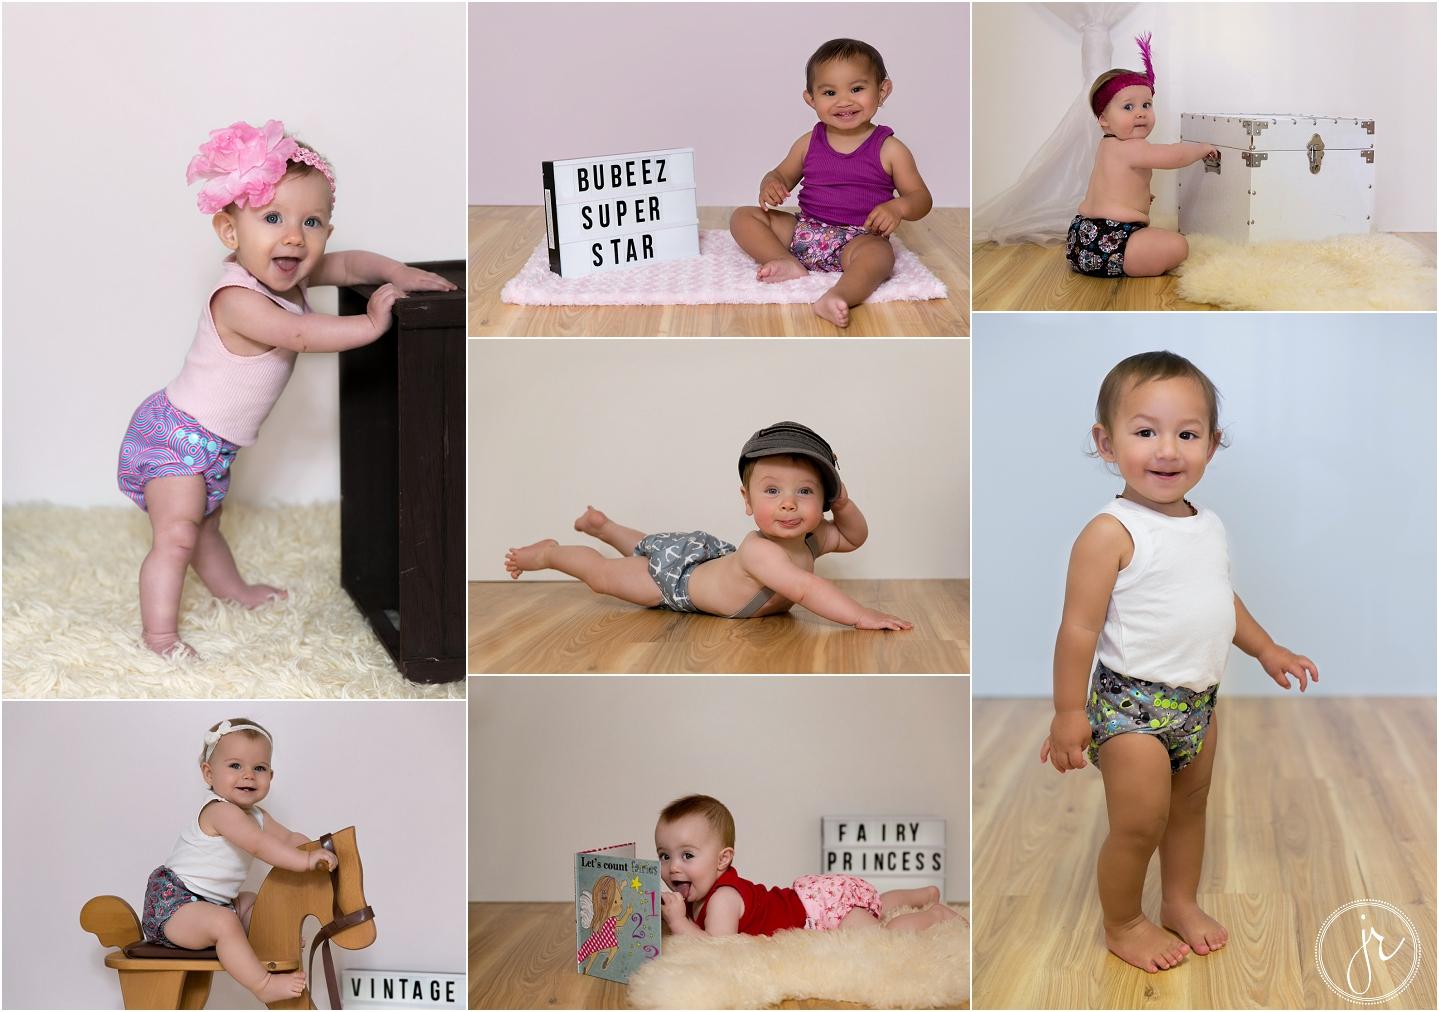 newborn photography gold coast baby photos jade read photography bubeez babes superstar search